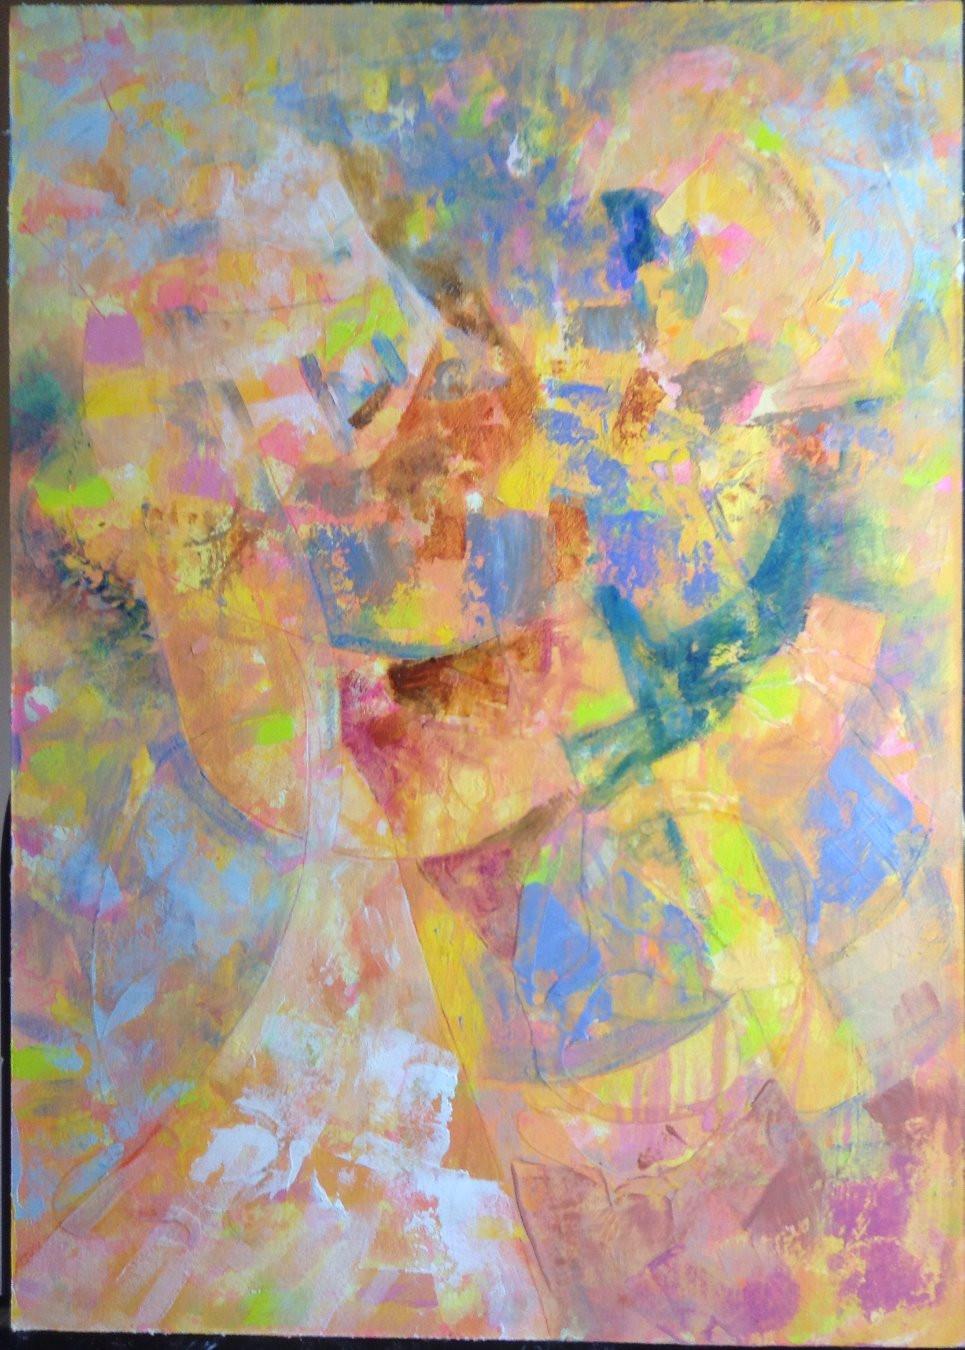 earth tone abstract art